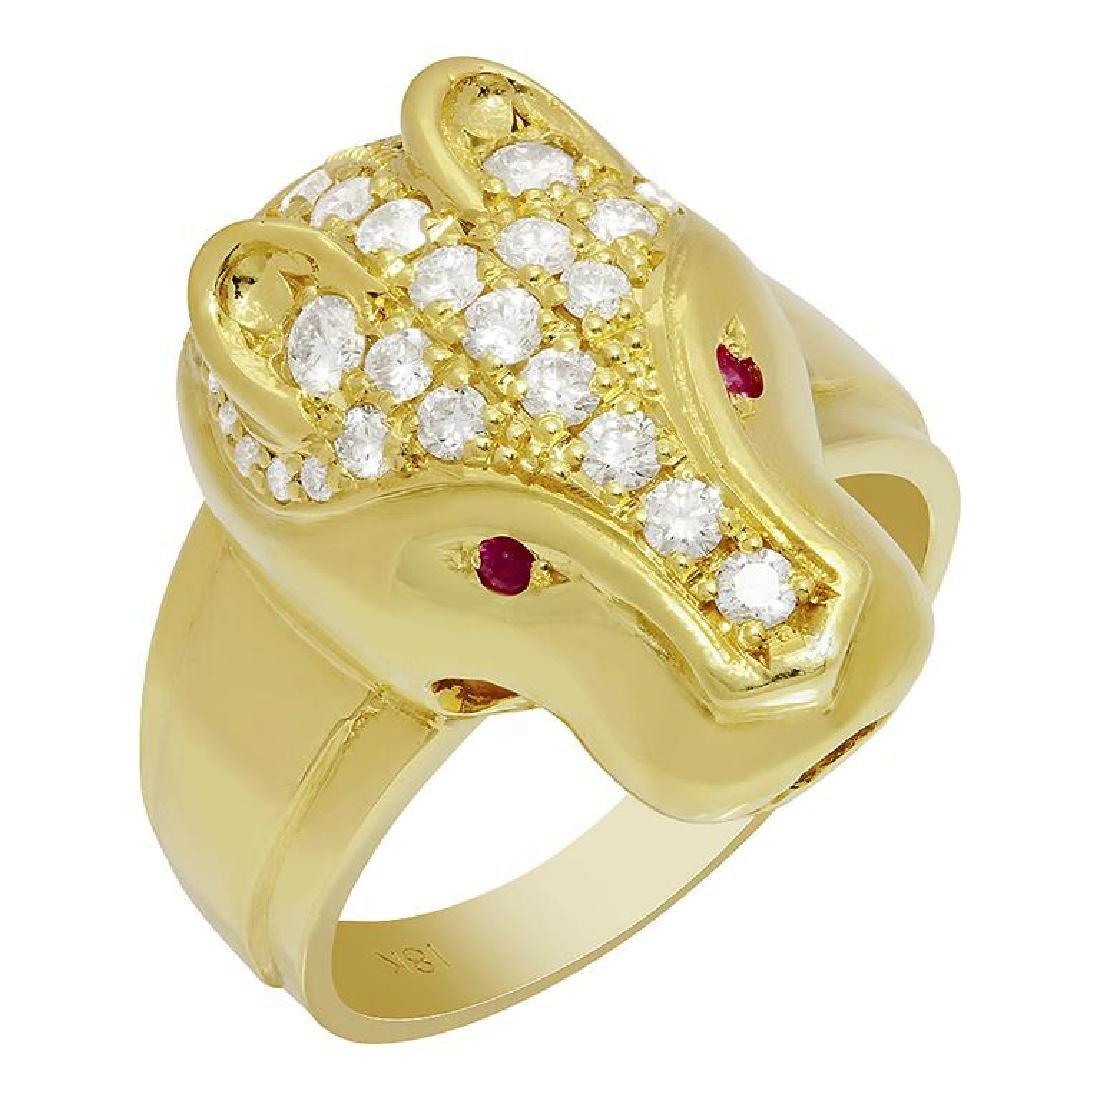 14k Yellow Gold 0.05ct Ruby 1.07ct Diamond Ring